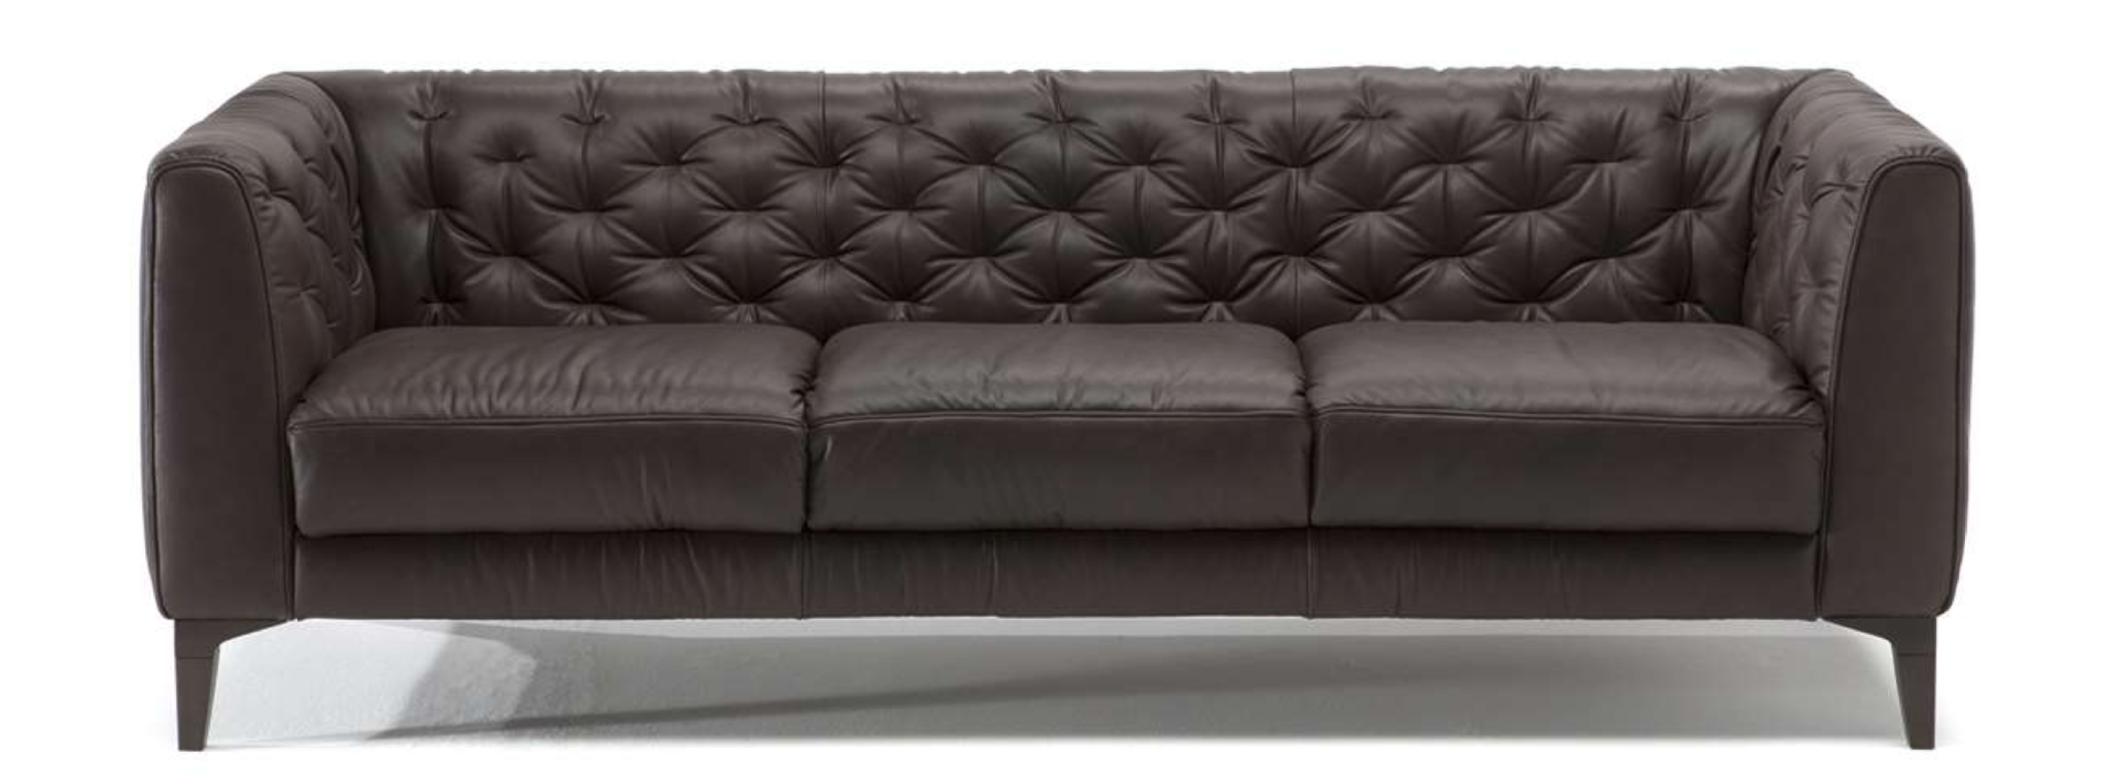 Placer Sofa By Natuzzi Natuzzi Sofa Leather Fabric